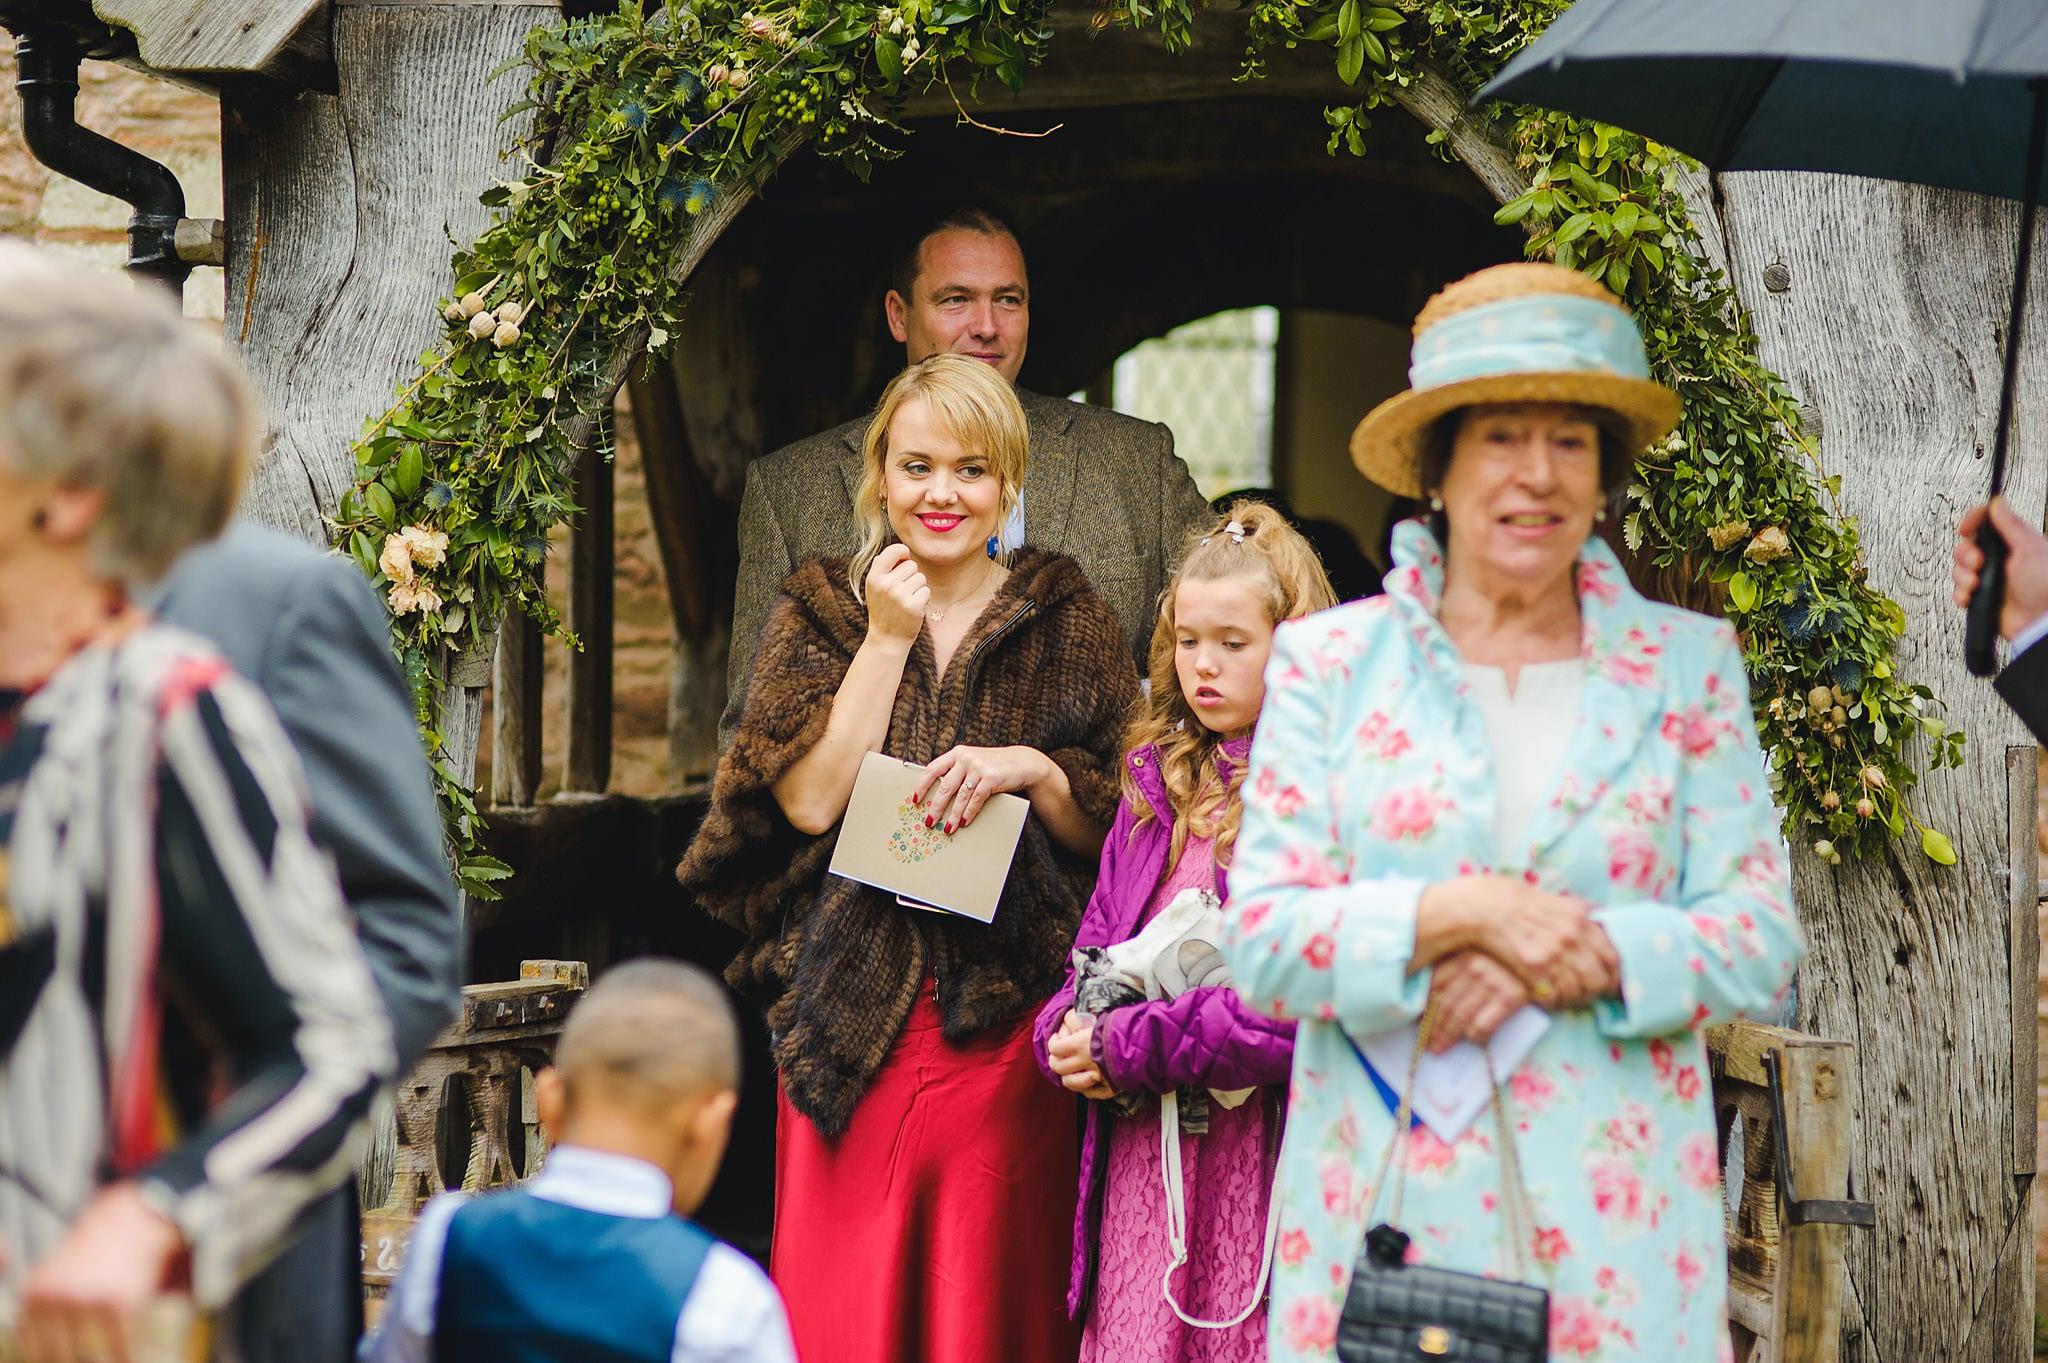 Dewsall Court wedding photography Herefordshire | Laura + Alex 59